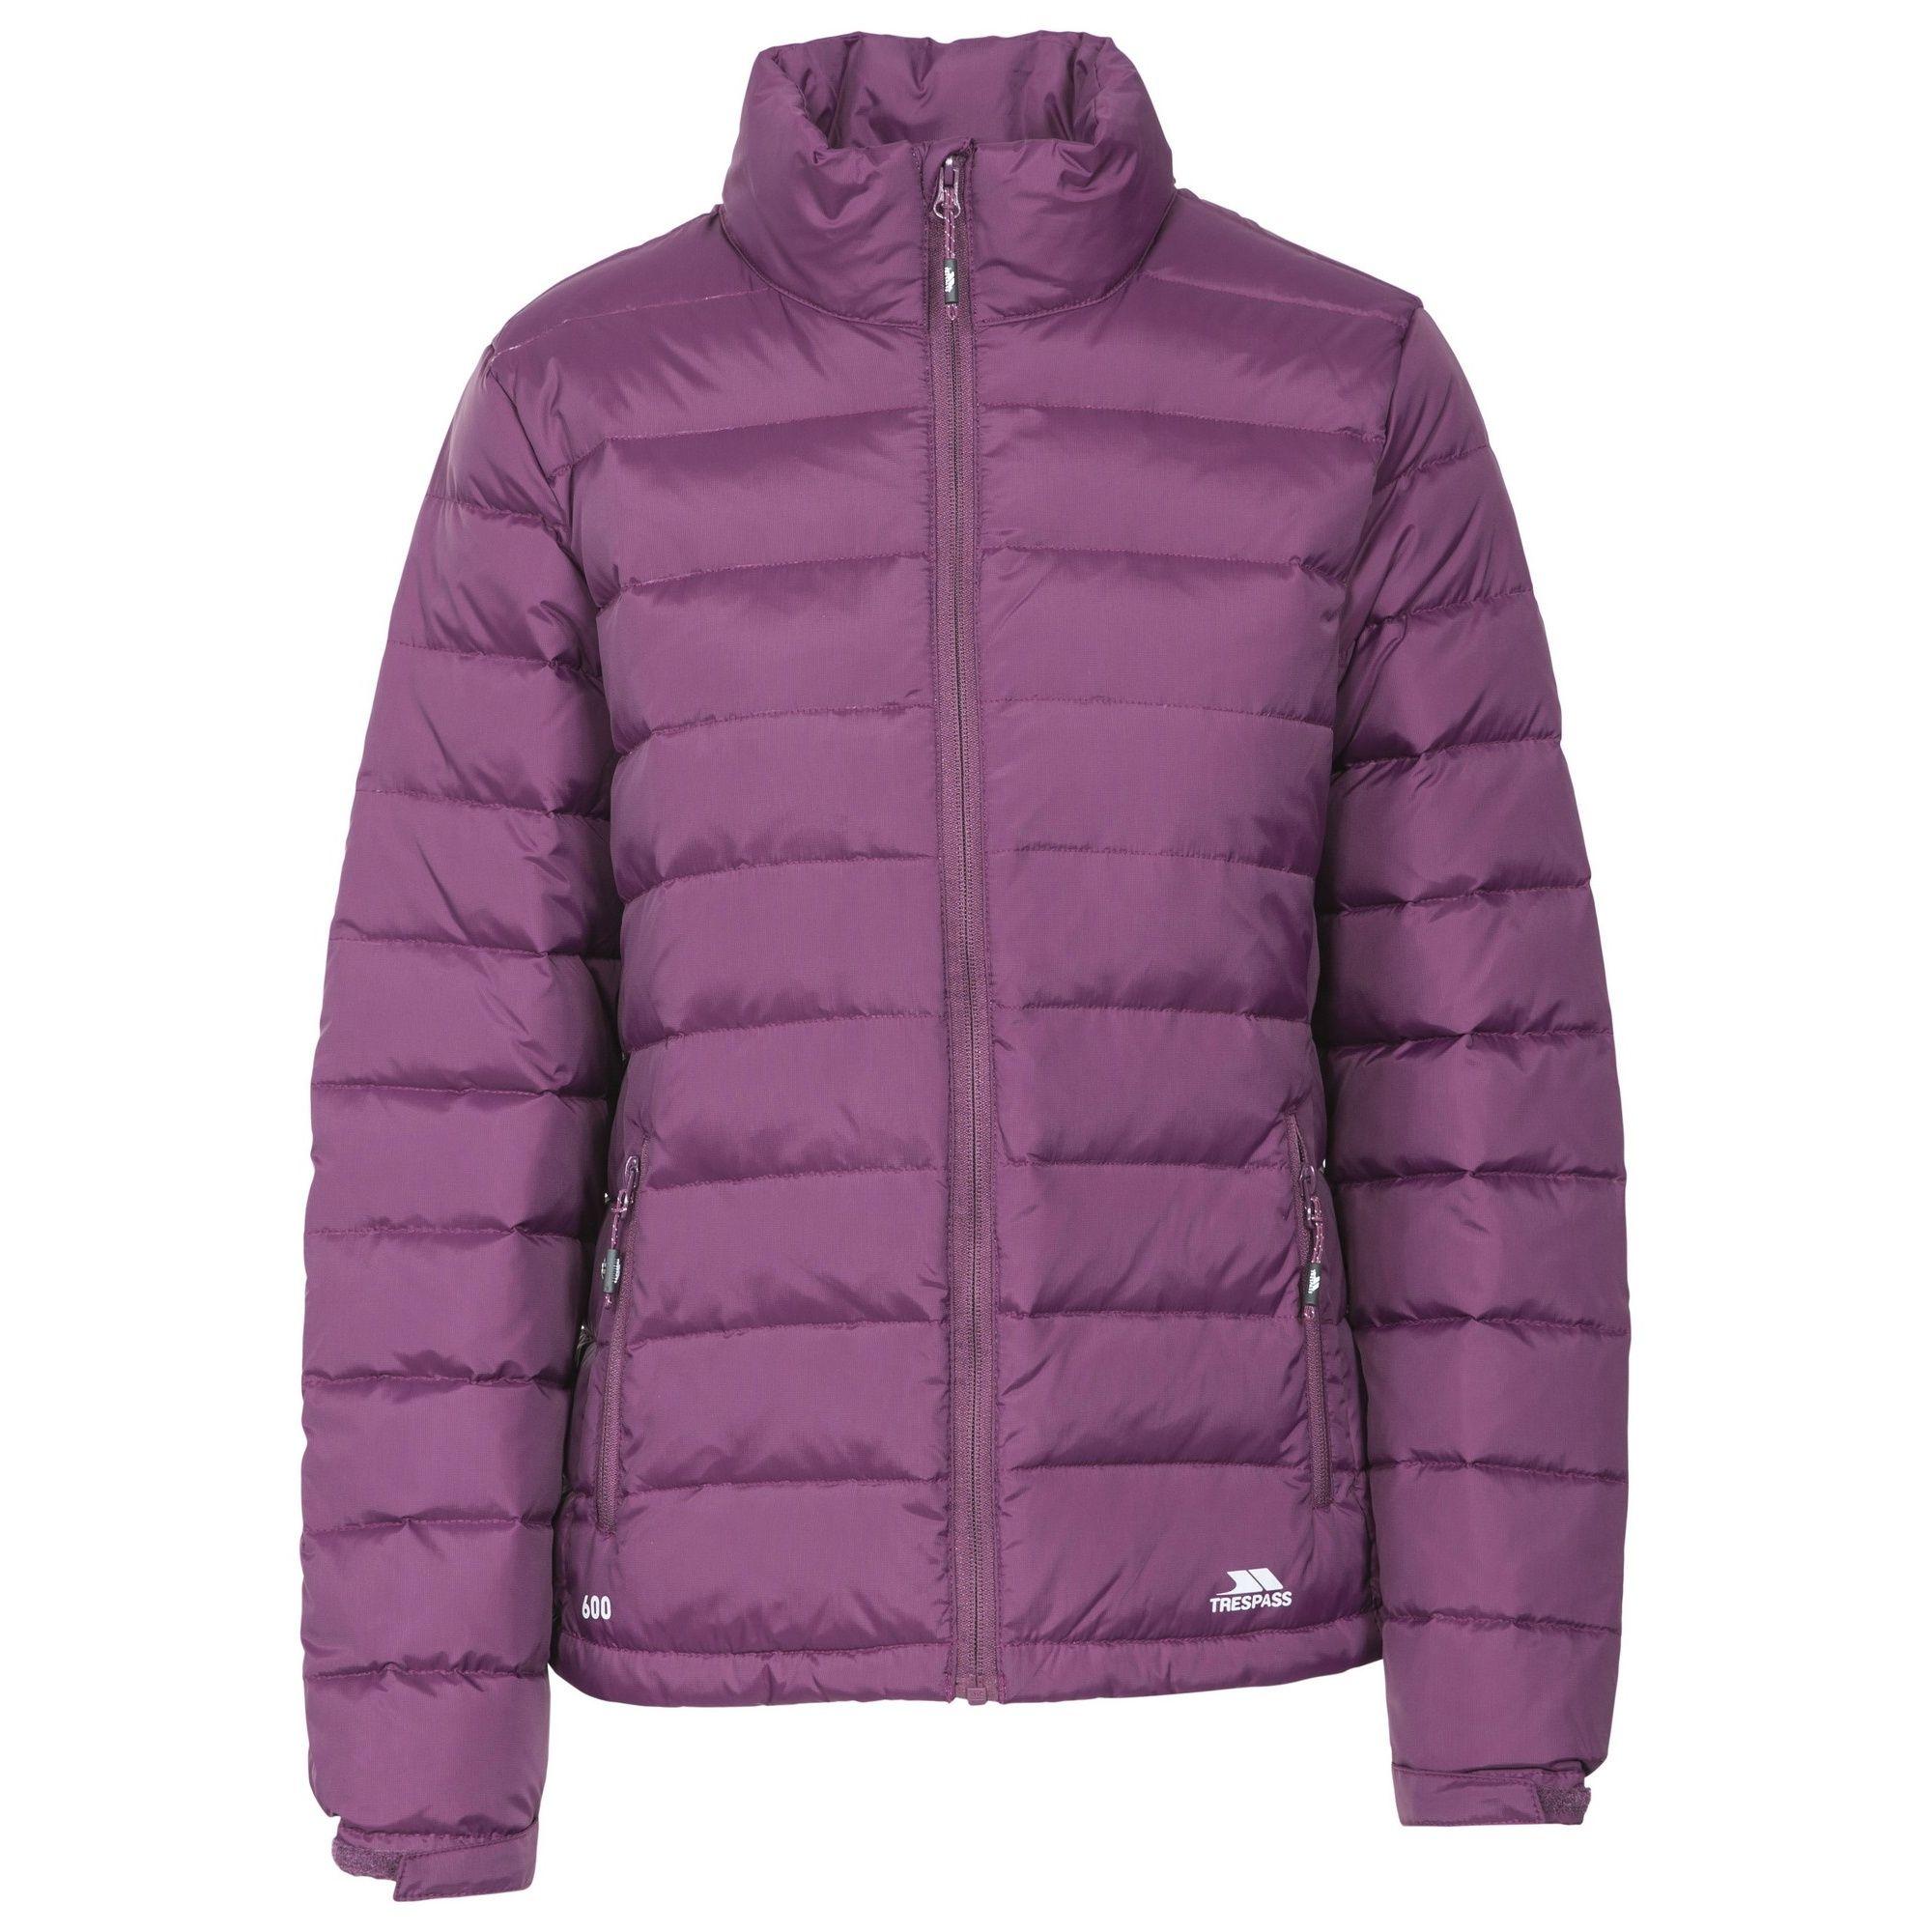 Trespass Womens/Ladies Letty Full Zip Up Down Jacket